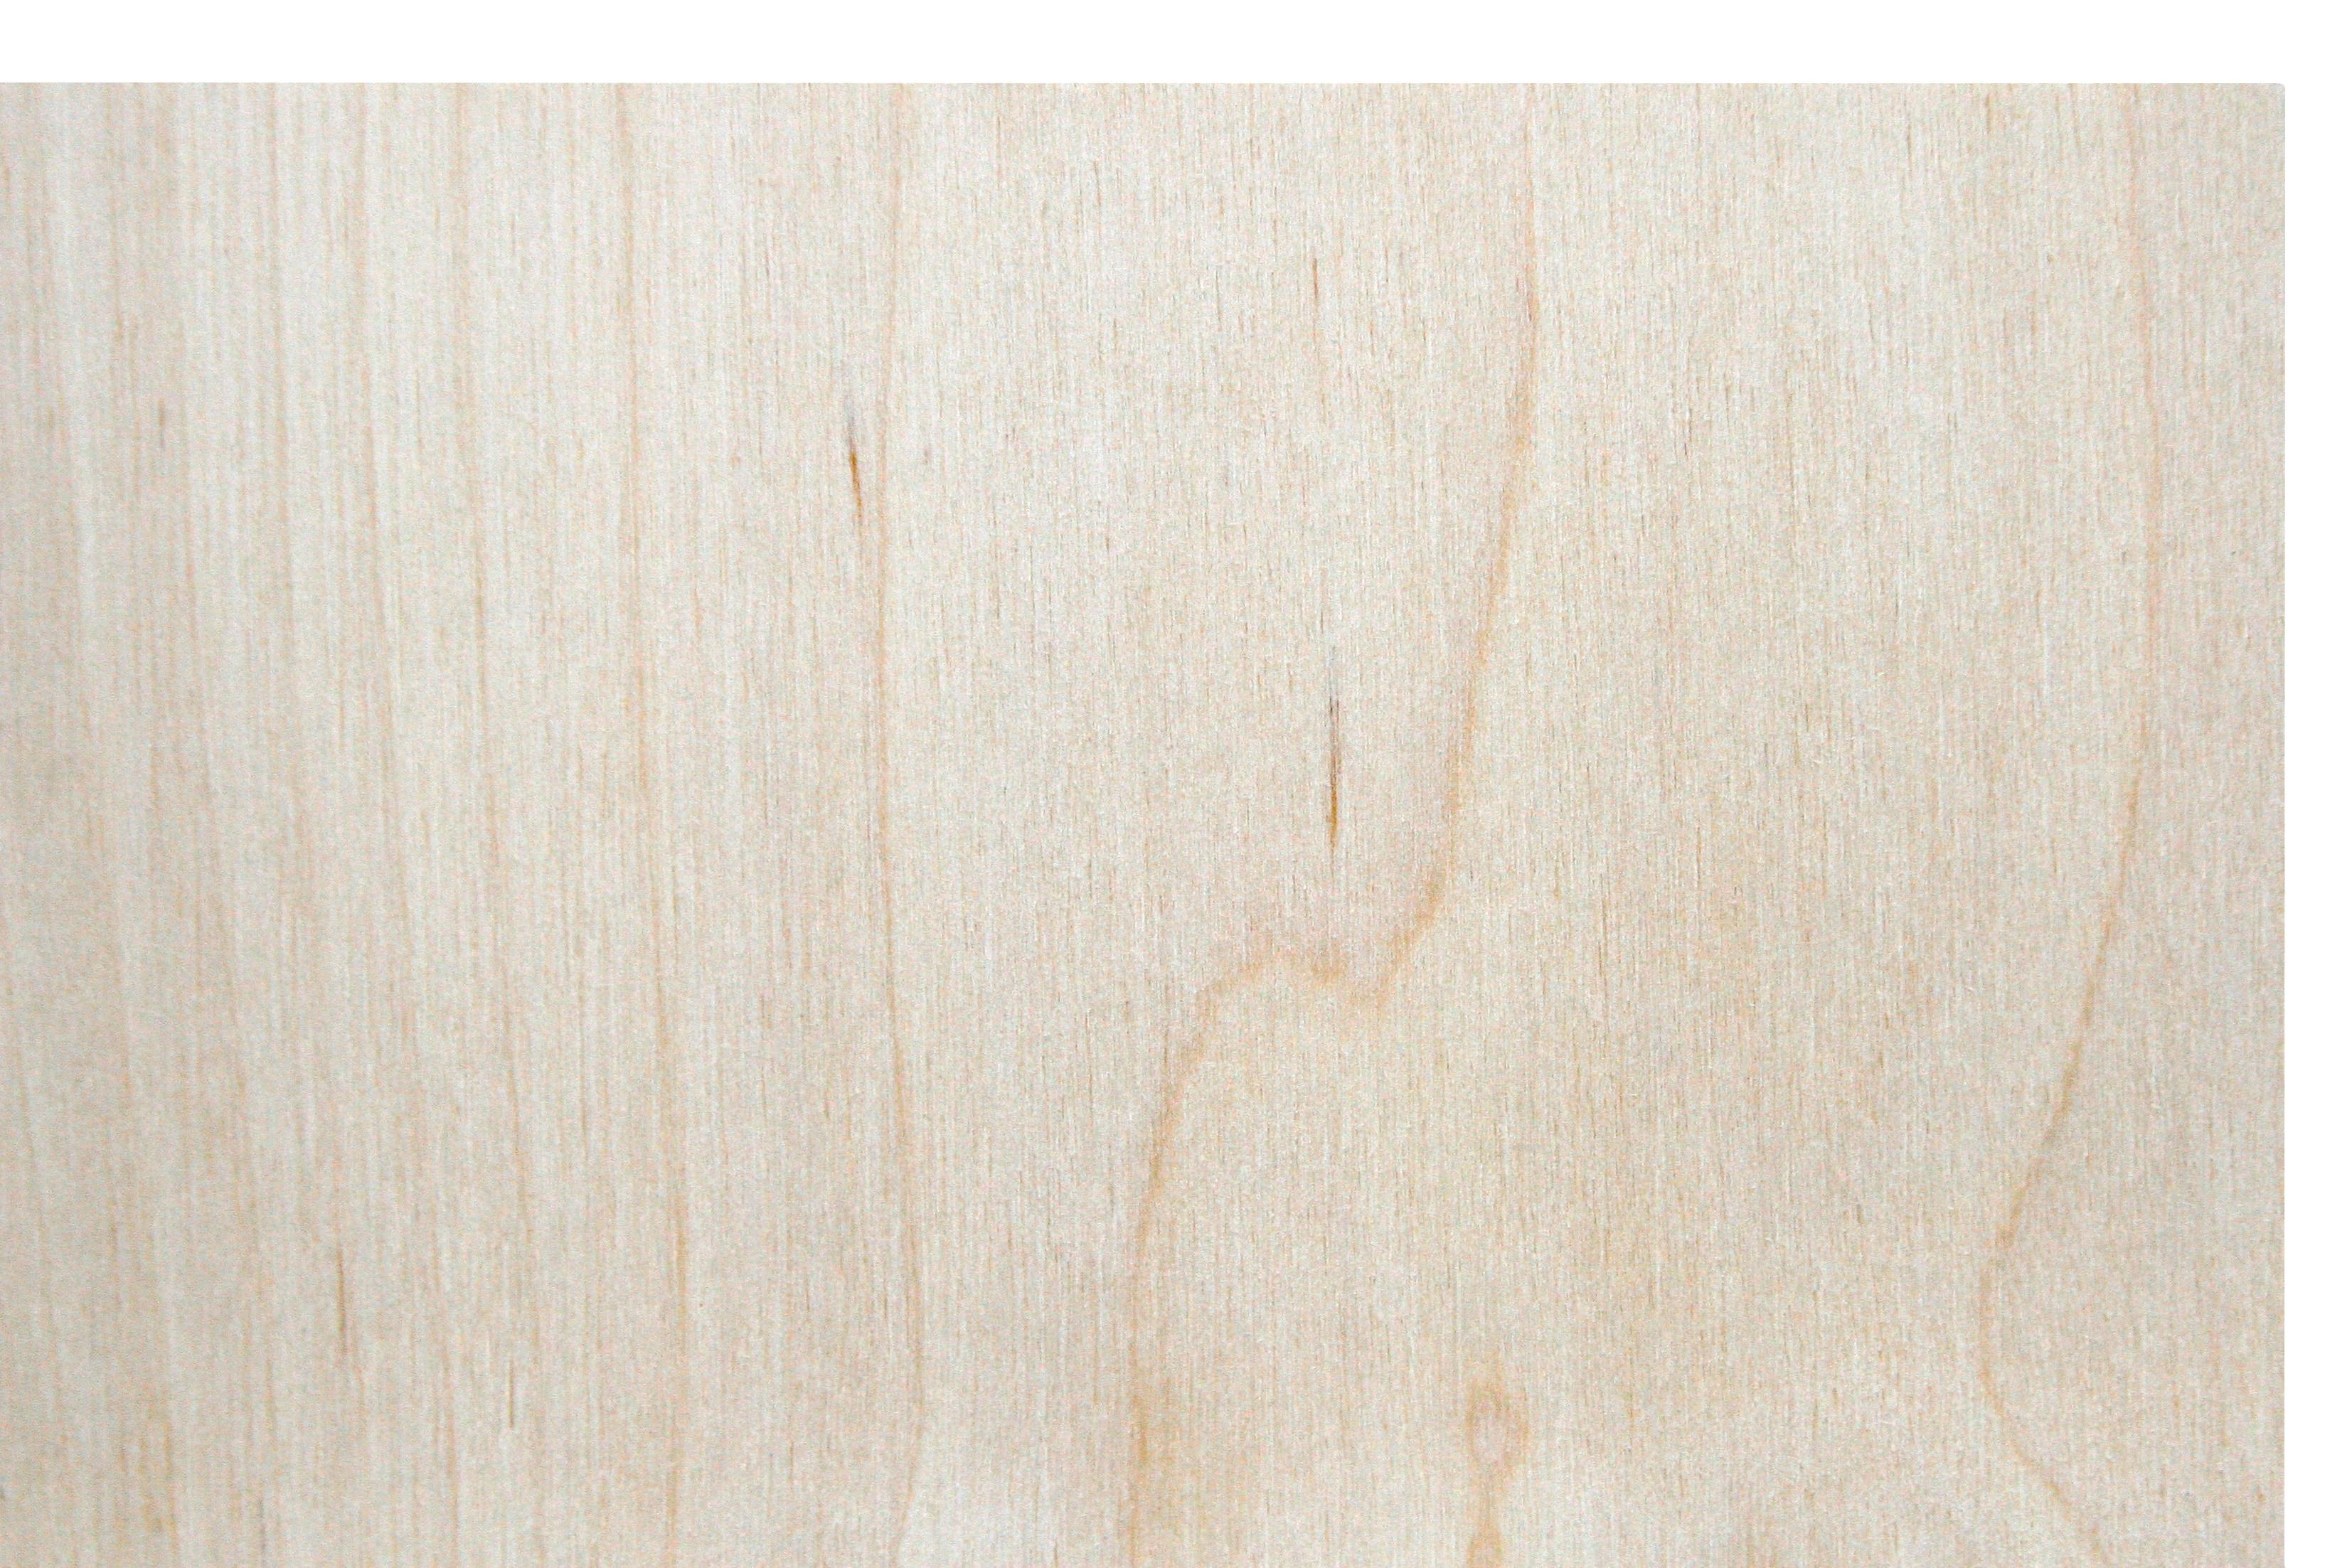 Welldonewood Baltic Birch Plywood 4x8 Baltic Birch Plywood Bb Bb